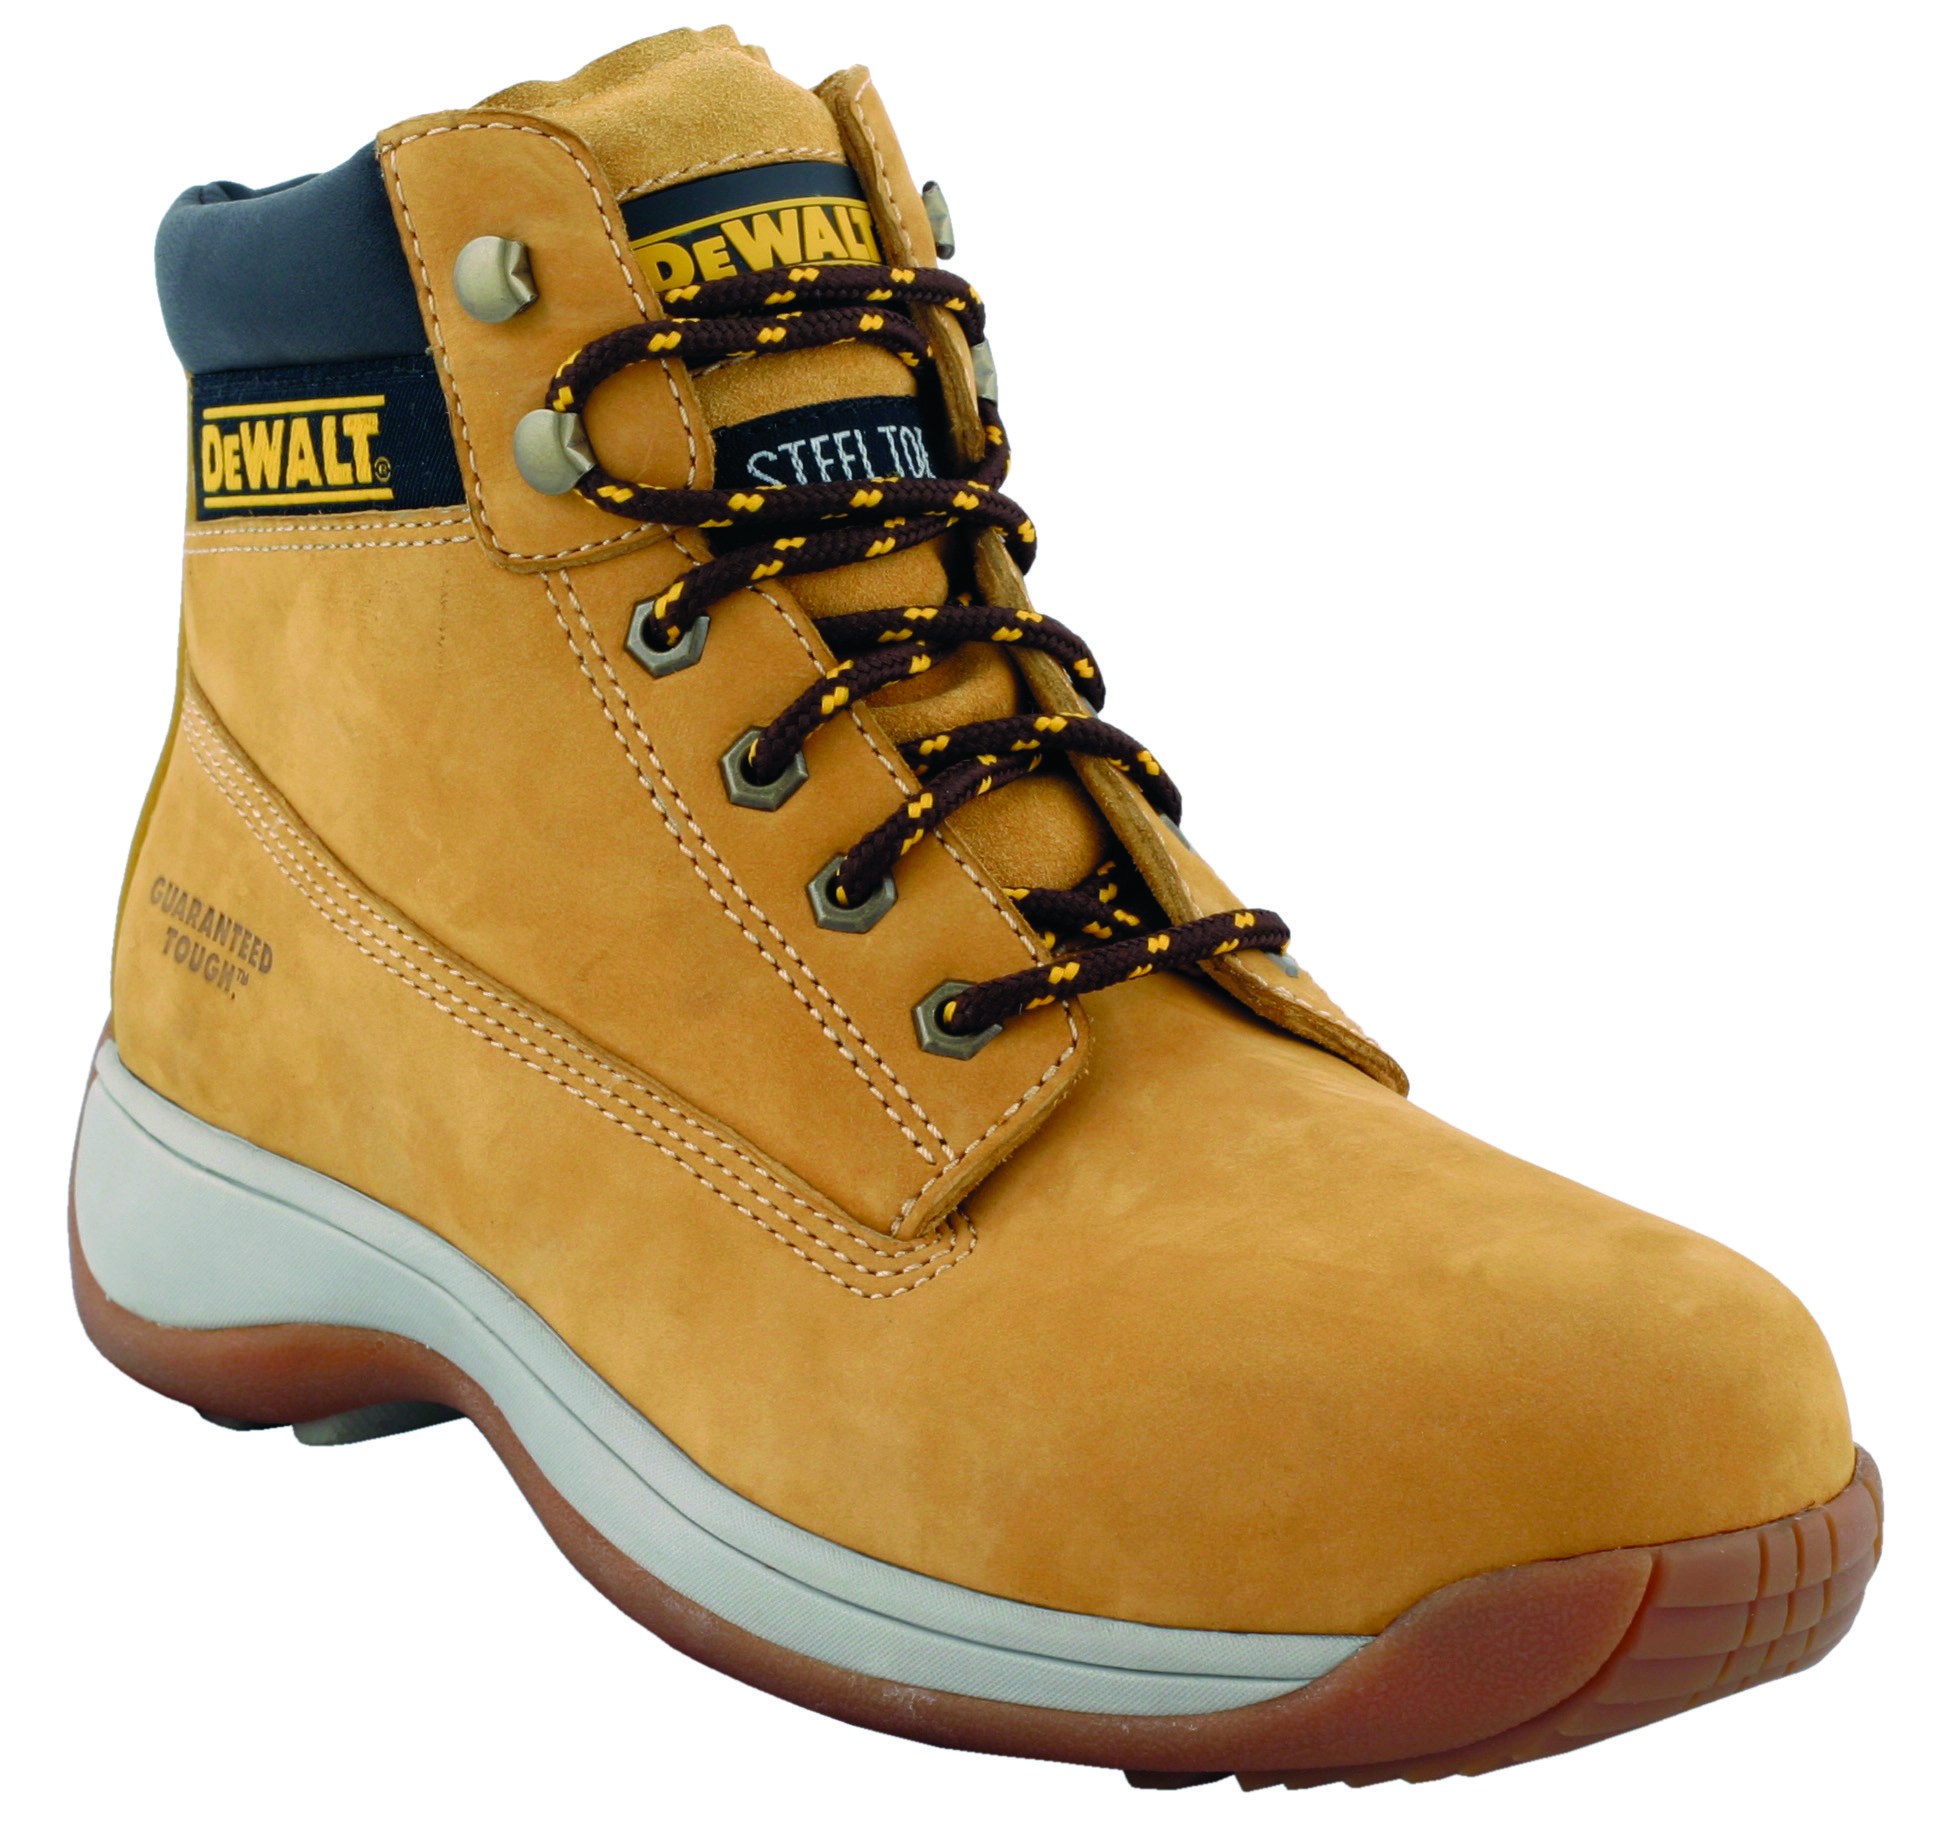 Dewalt 6 in workboot -honey Safety Shoes in Dubai,UAE - APPRENTICE HN from AABTools